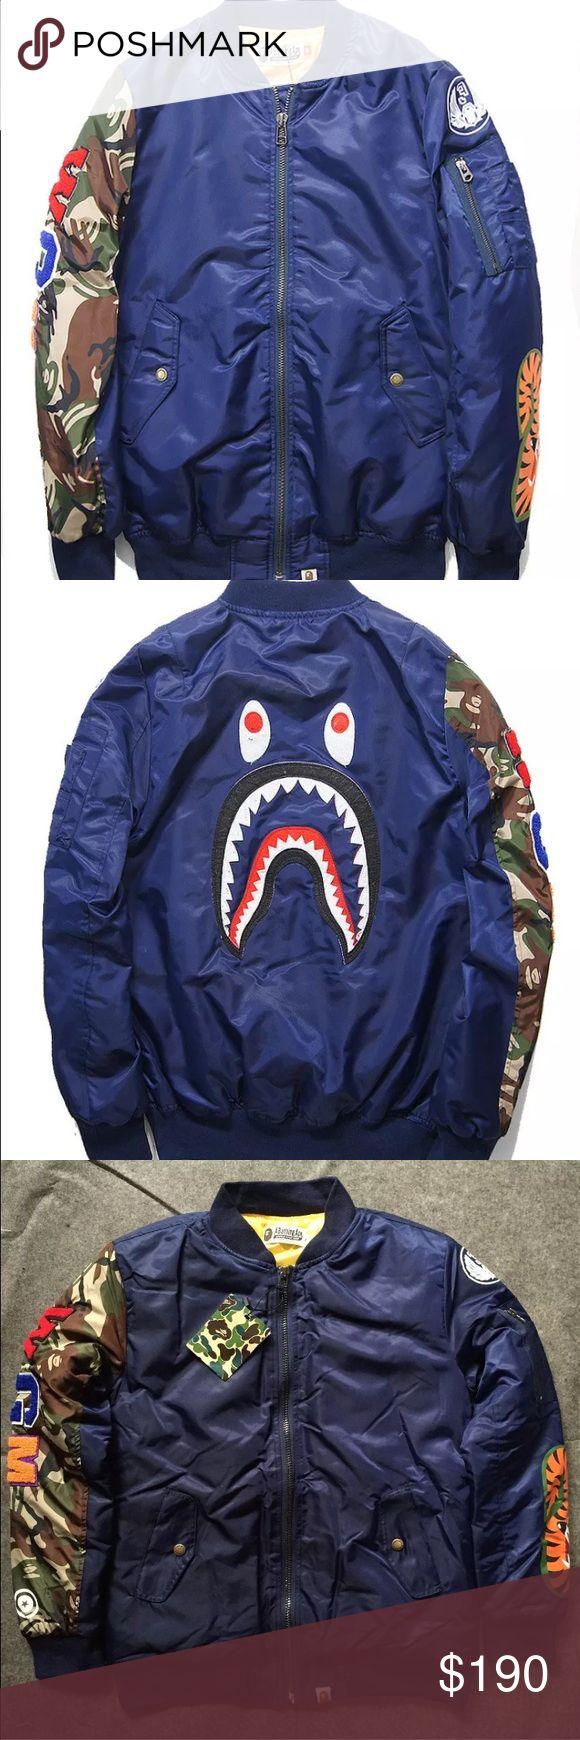 Bathing ape camo wgm bomber jacket New with tags! Bape Jackets & Coats Bomber & Varsity